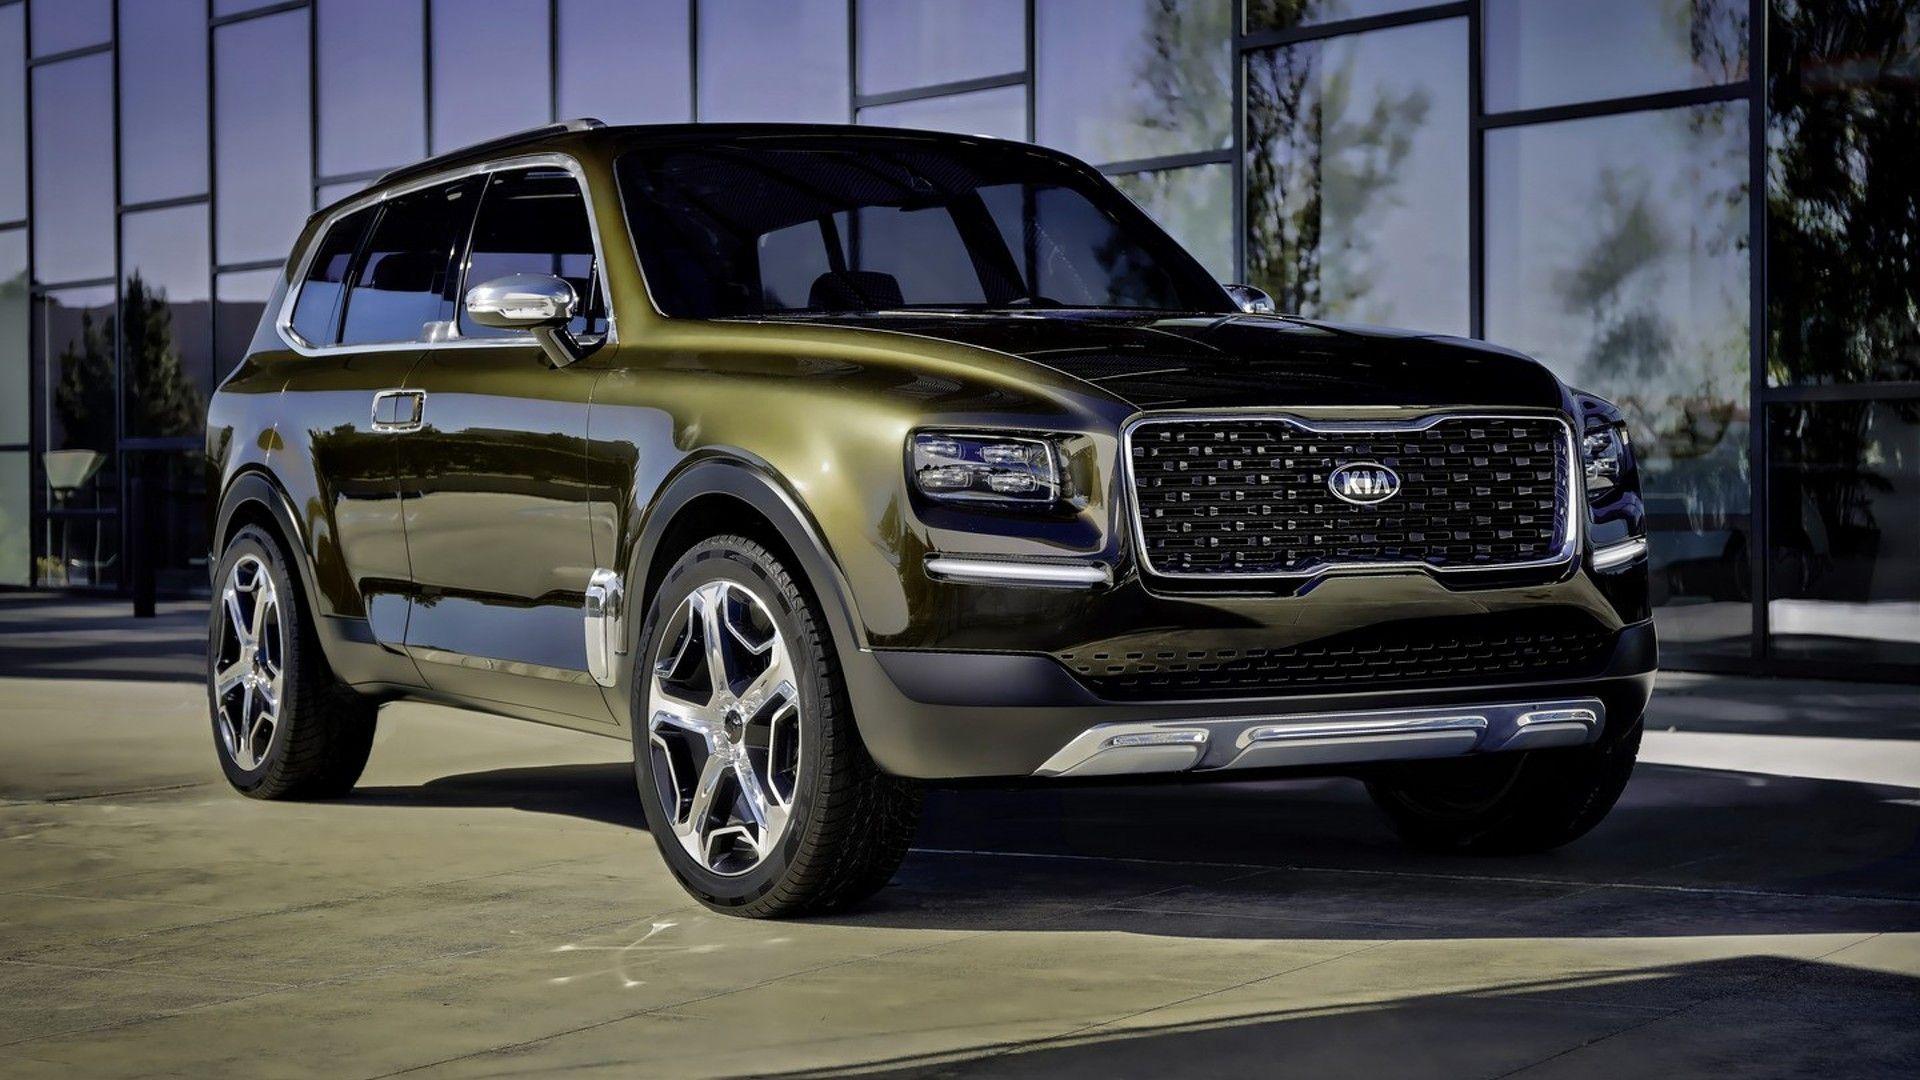 New Kia Mohave 2020 Engine Cars Review 2019 Luxury Suv Suv Kia Motors